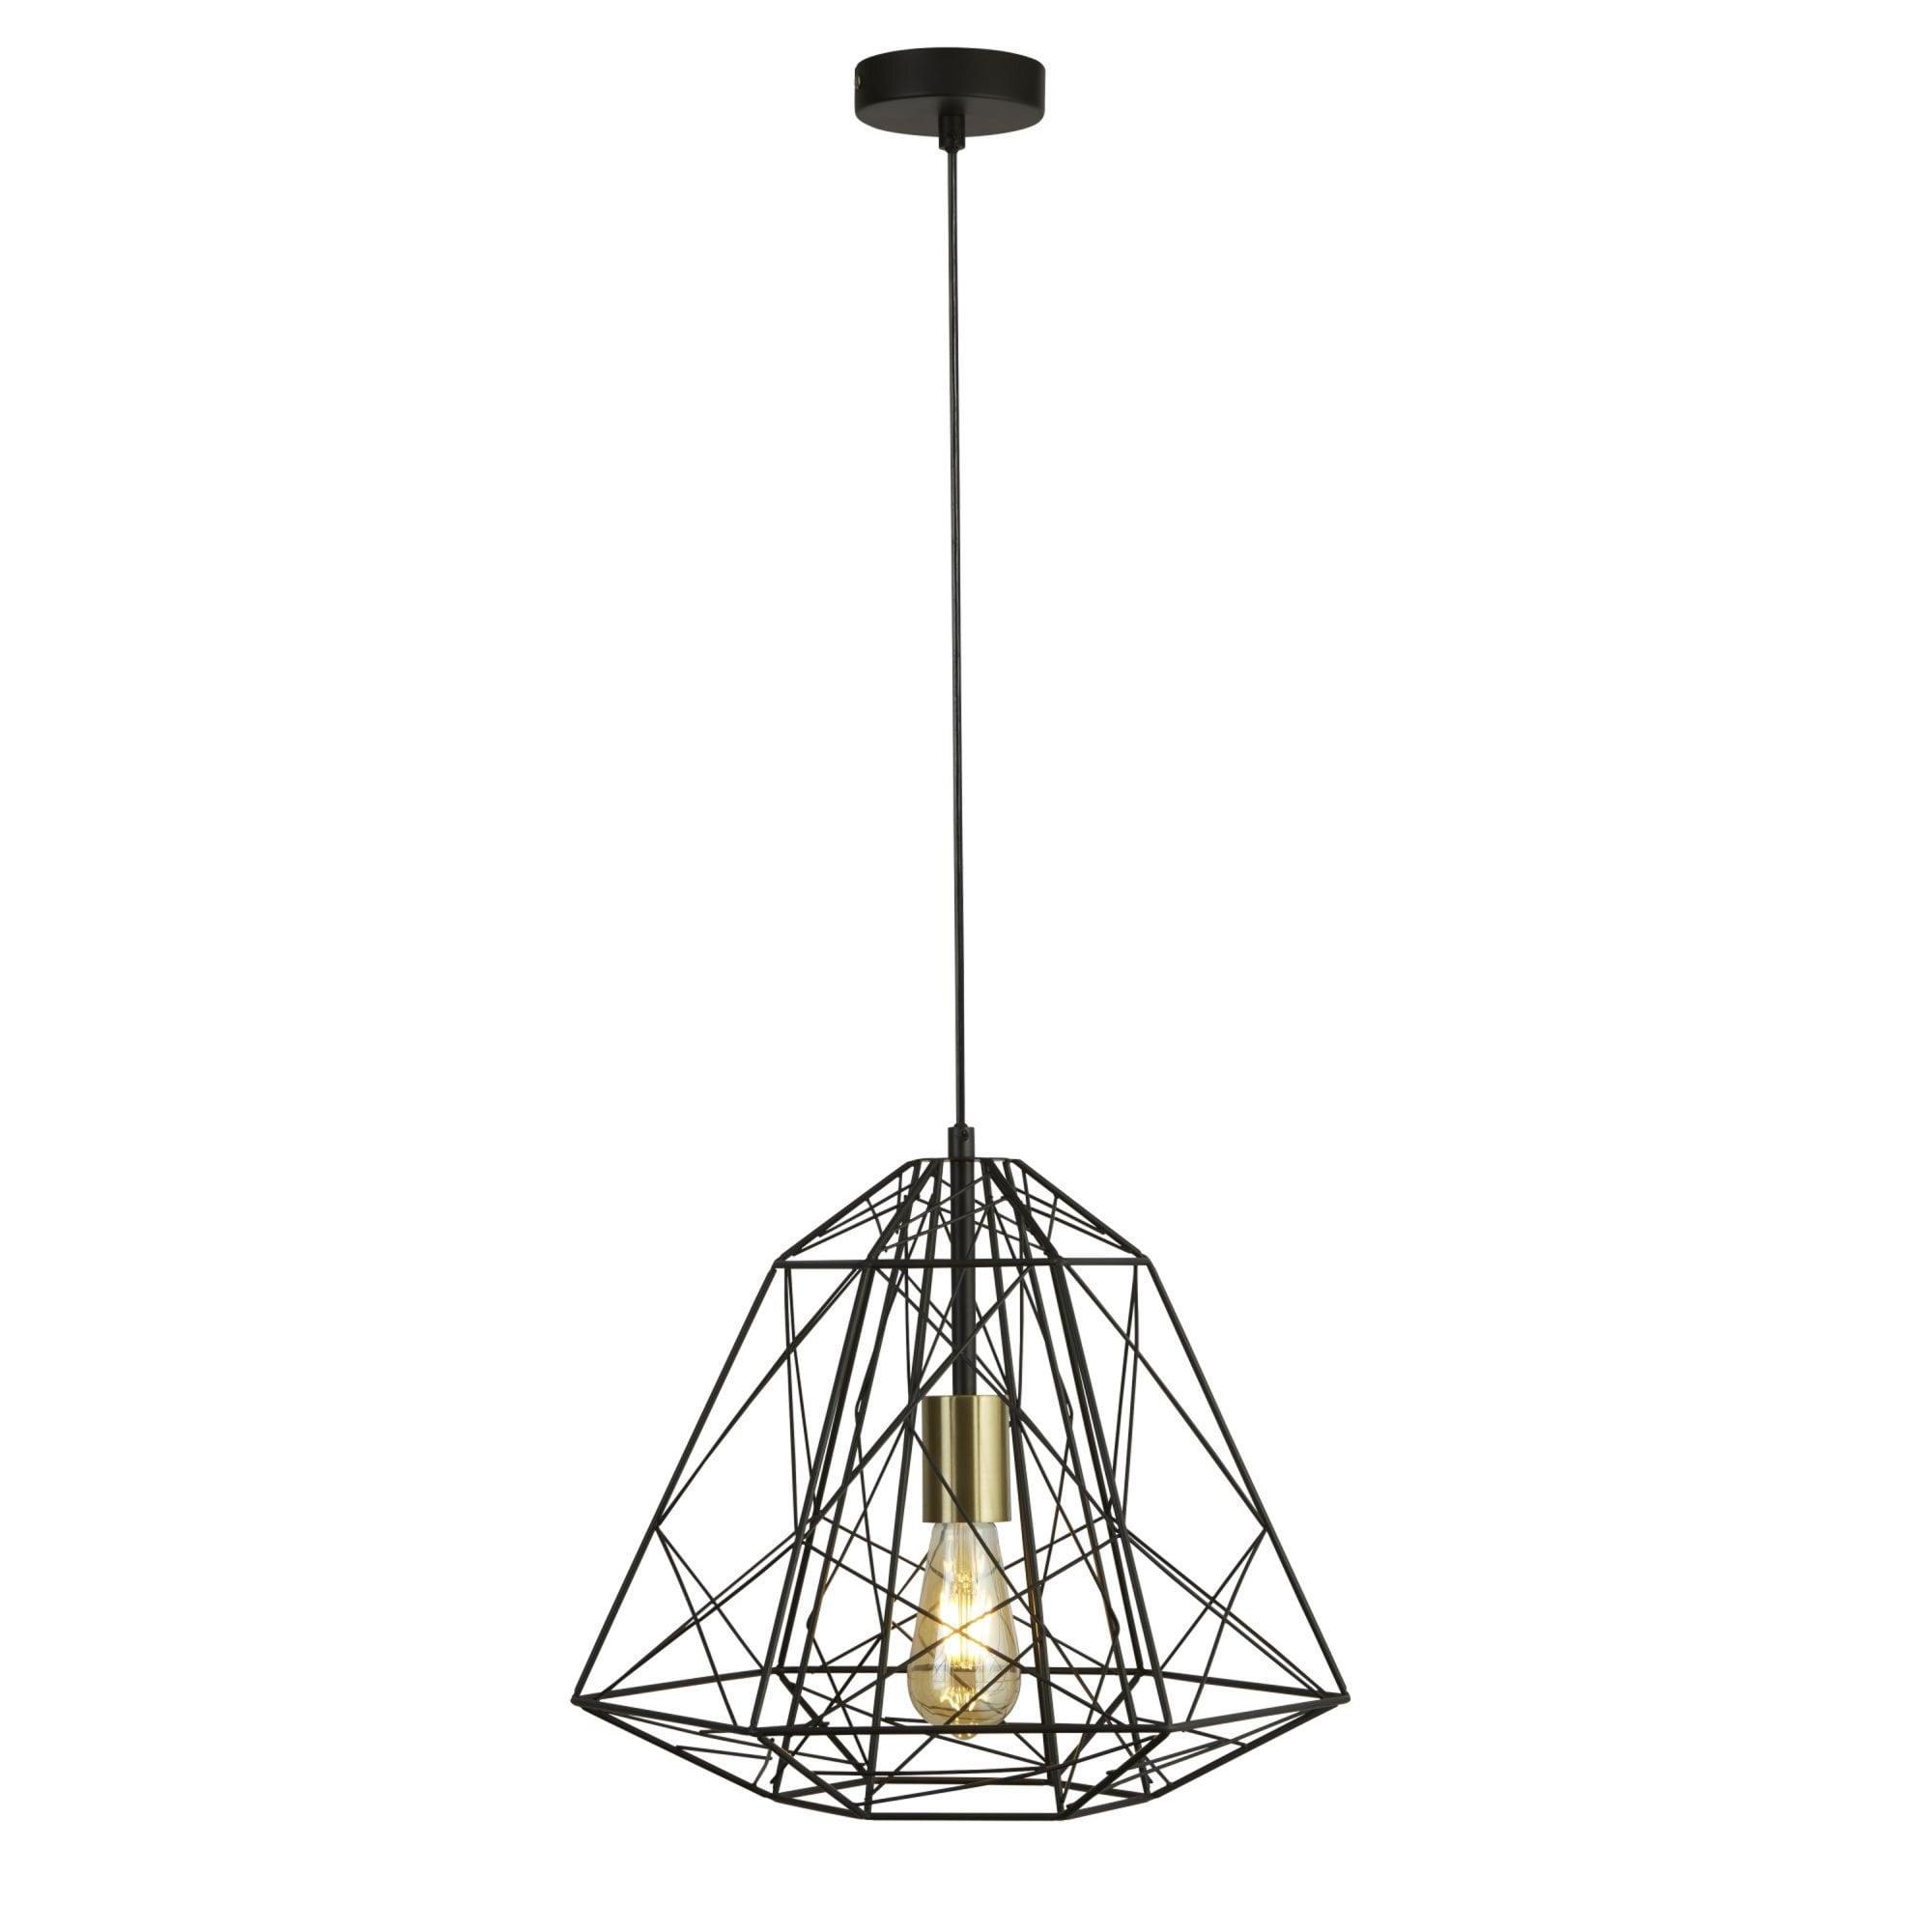 Geometric Cage Single Light Pendant Matt Black With Satin Brass Moonlight Design